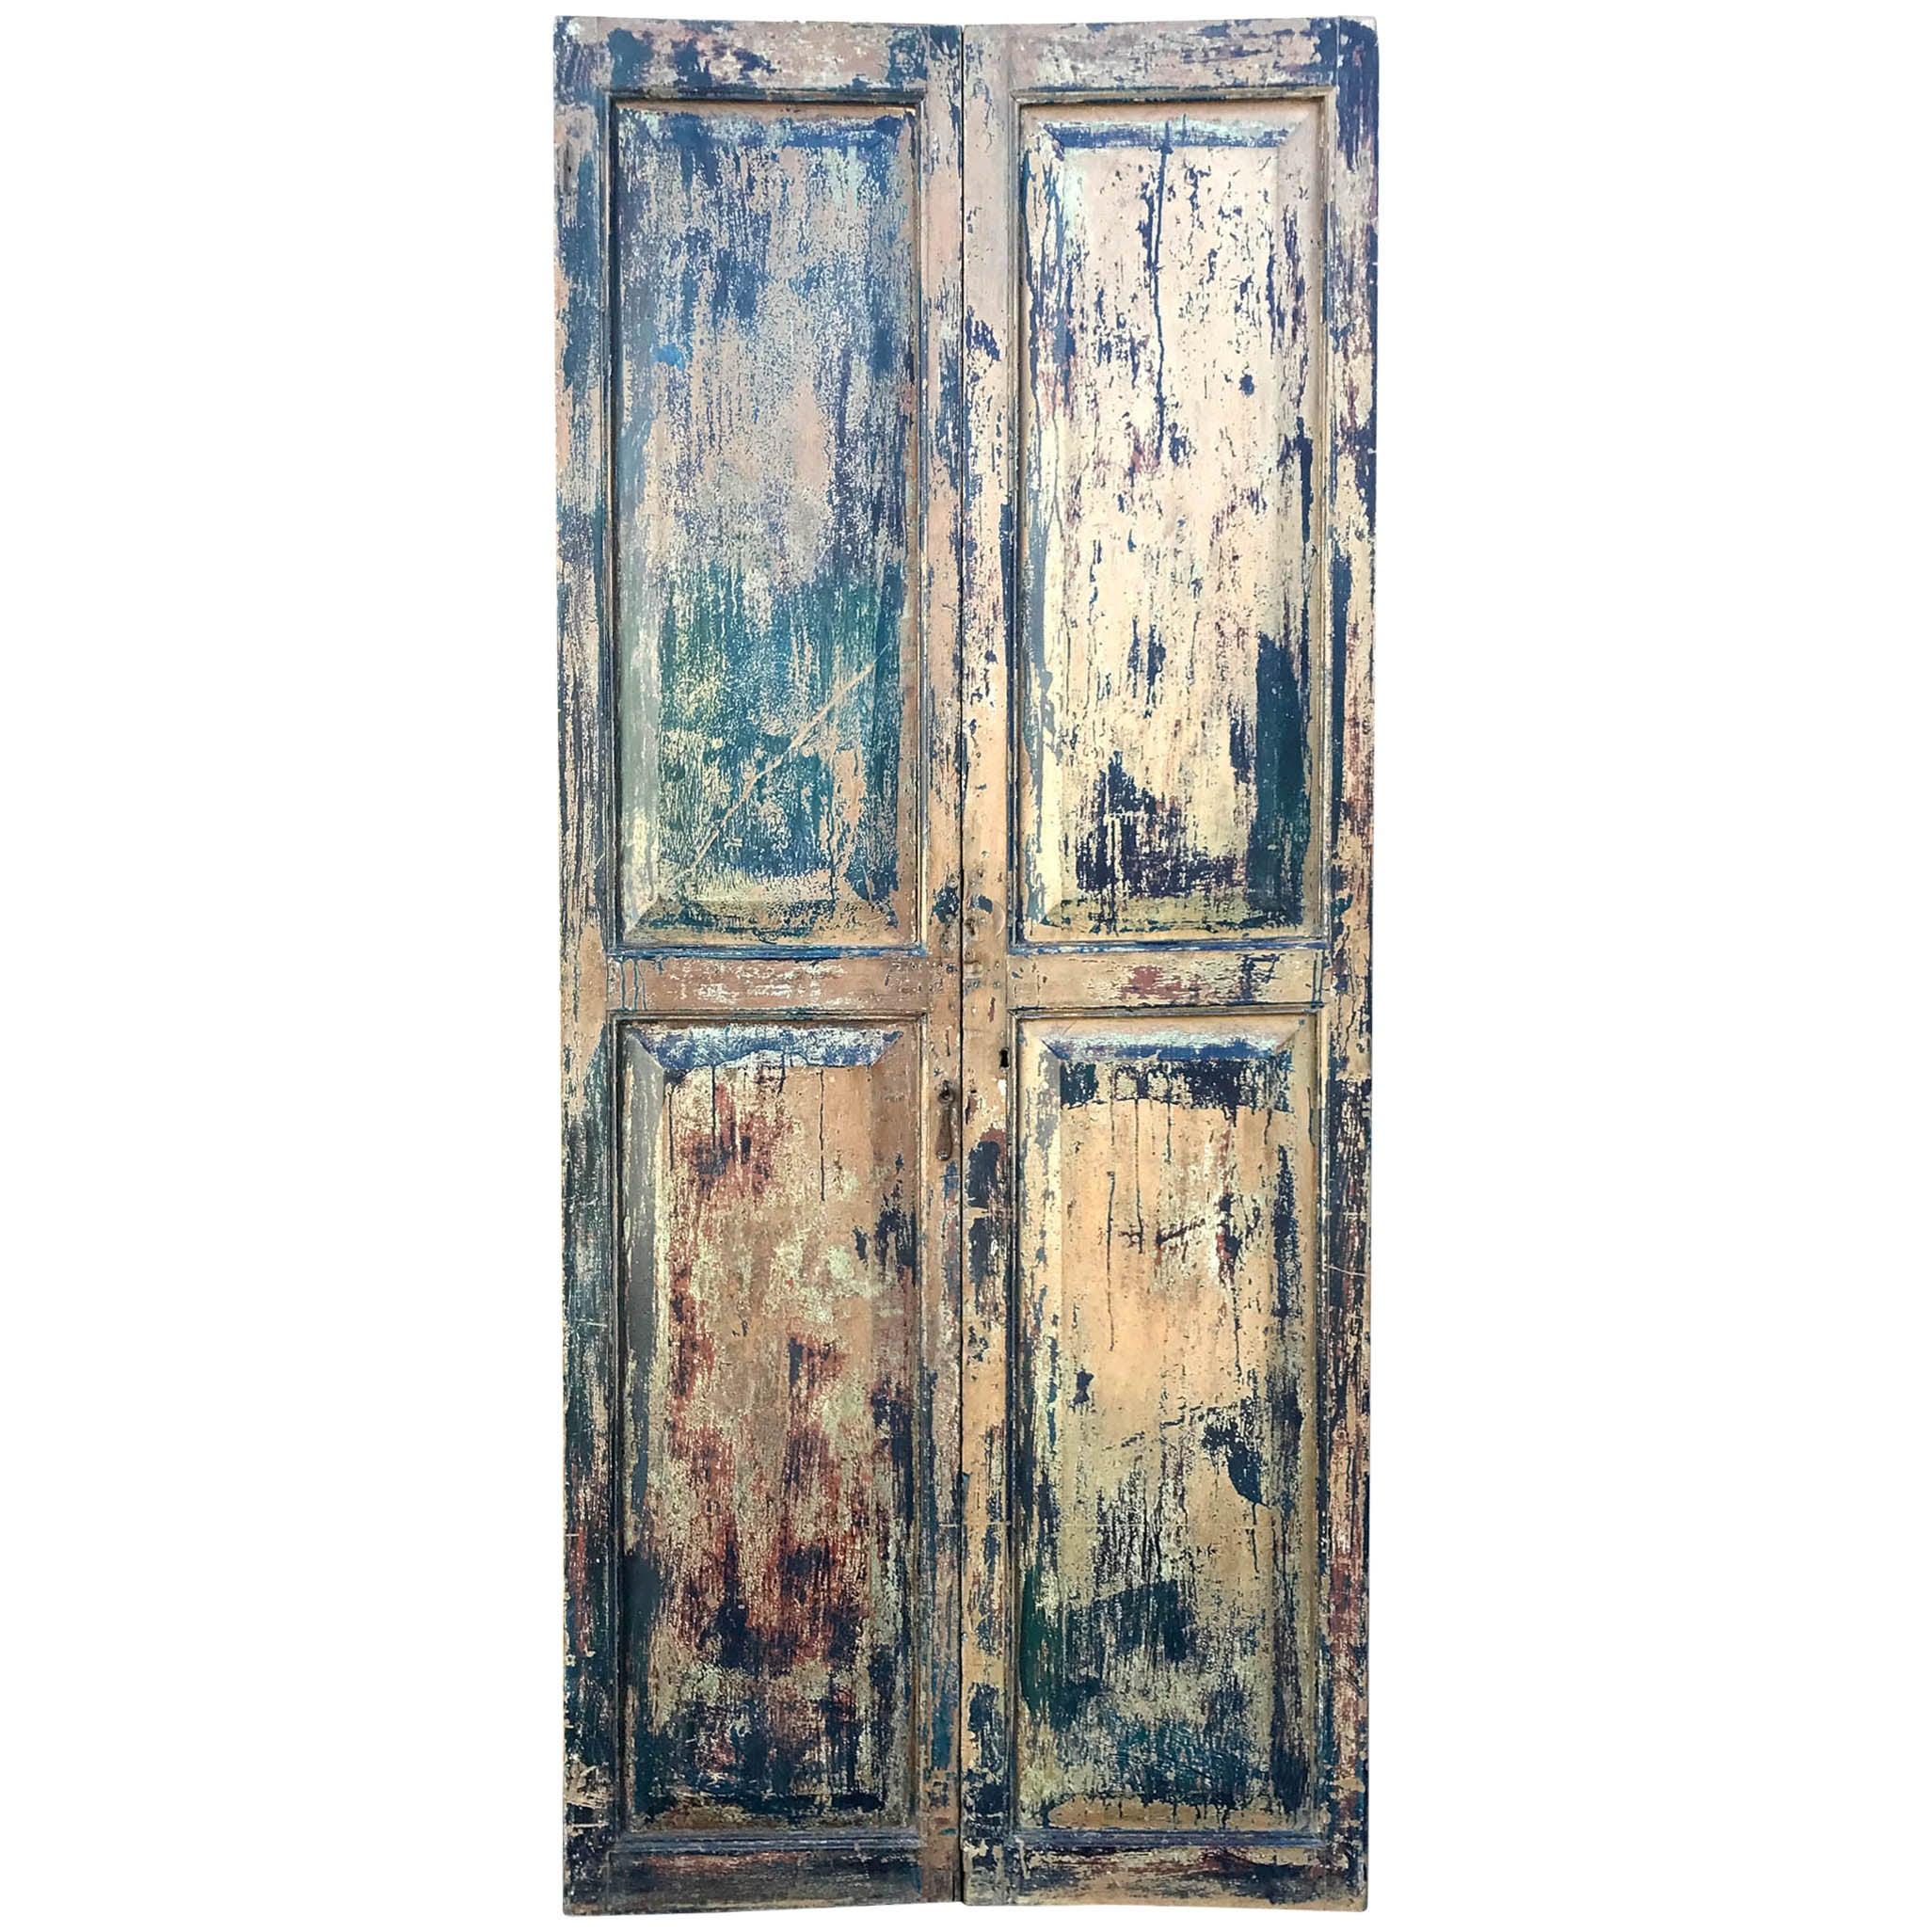 Pair of 19th Century Painted Doors